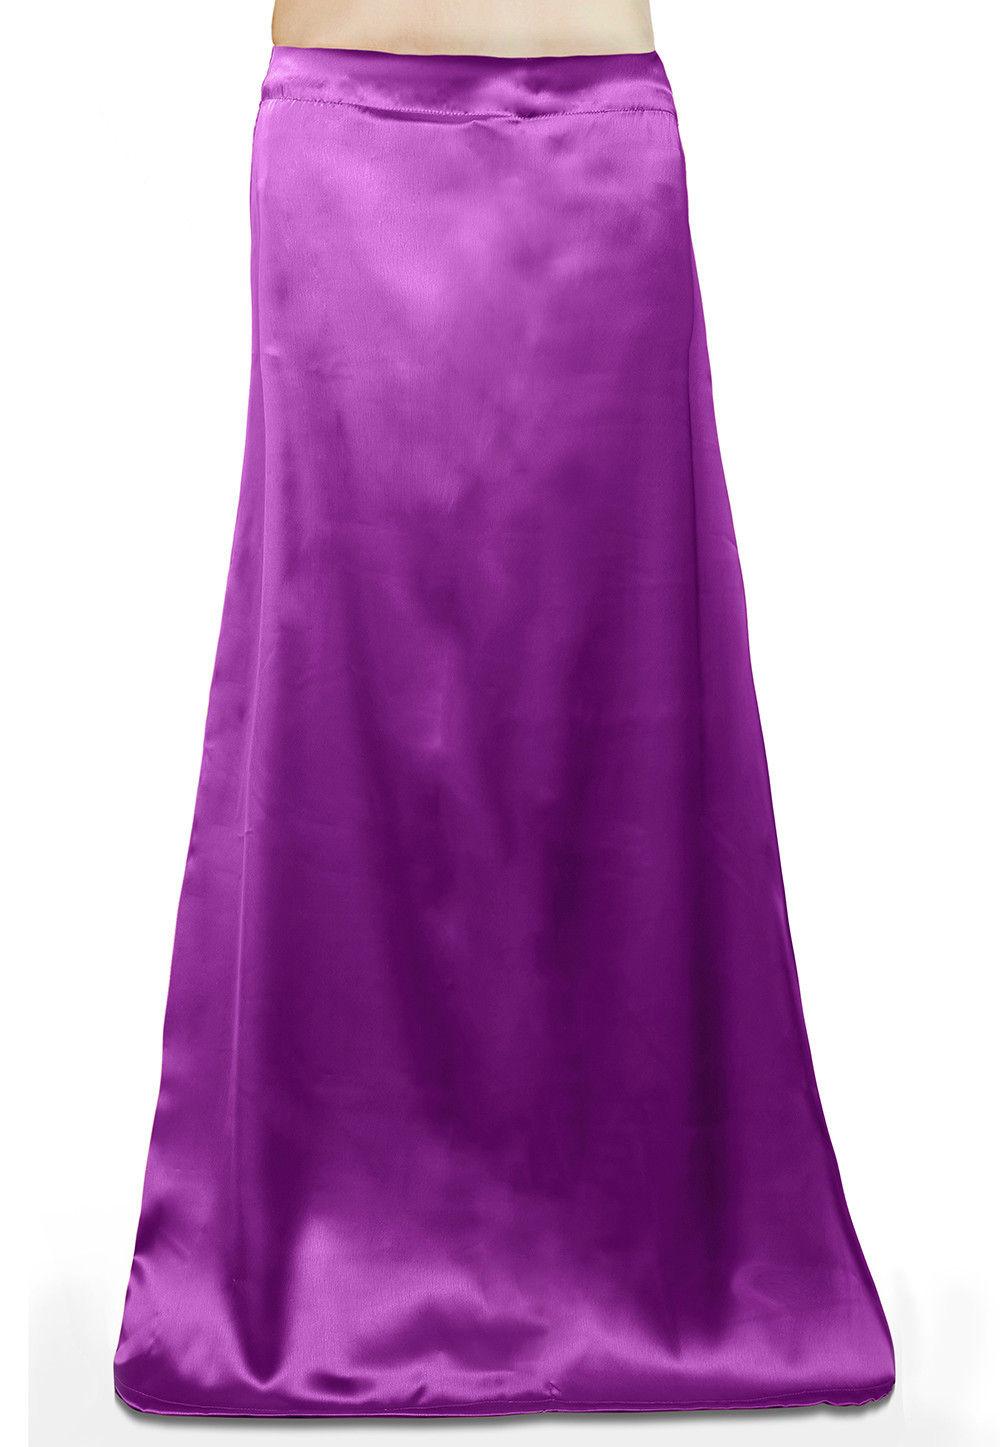 Satin Petticoat in Violet